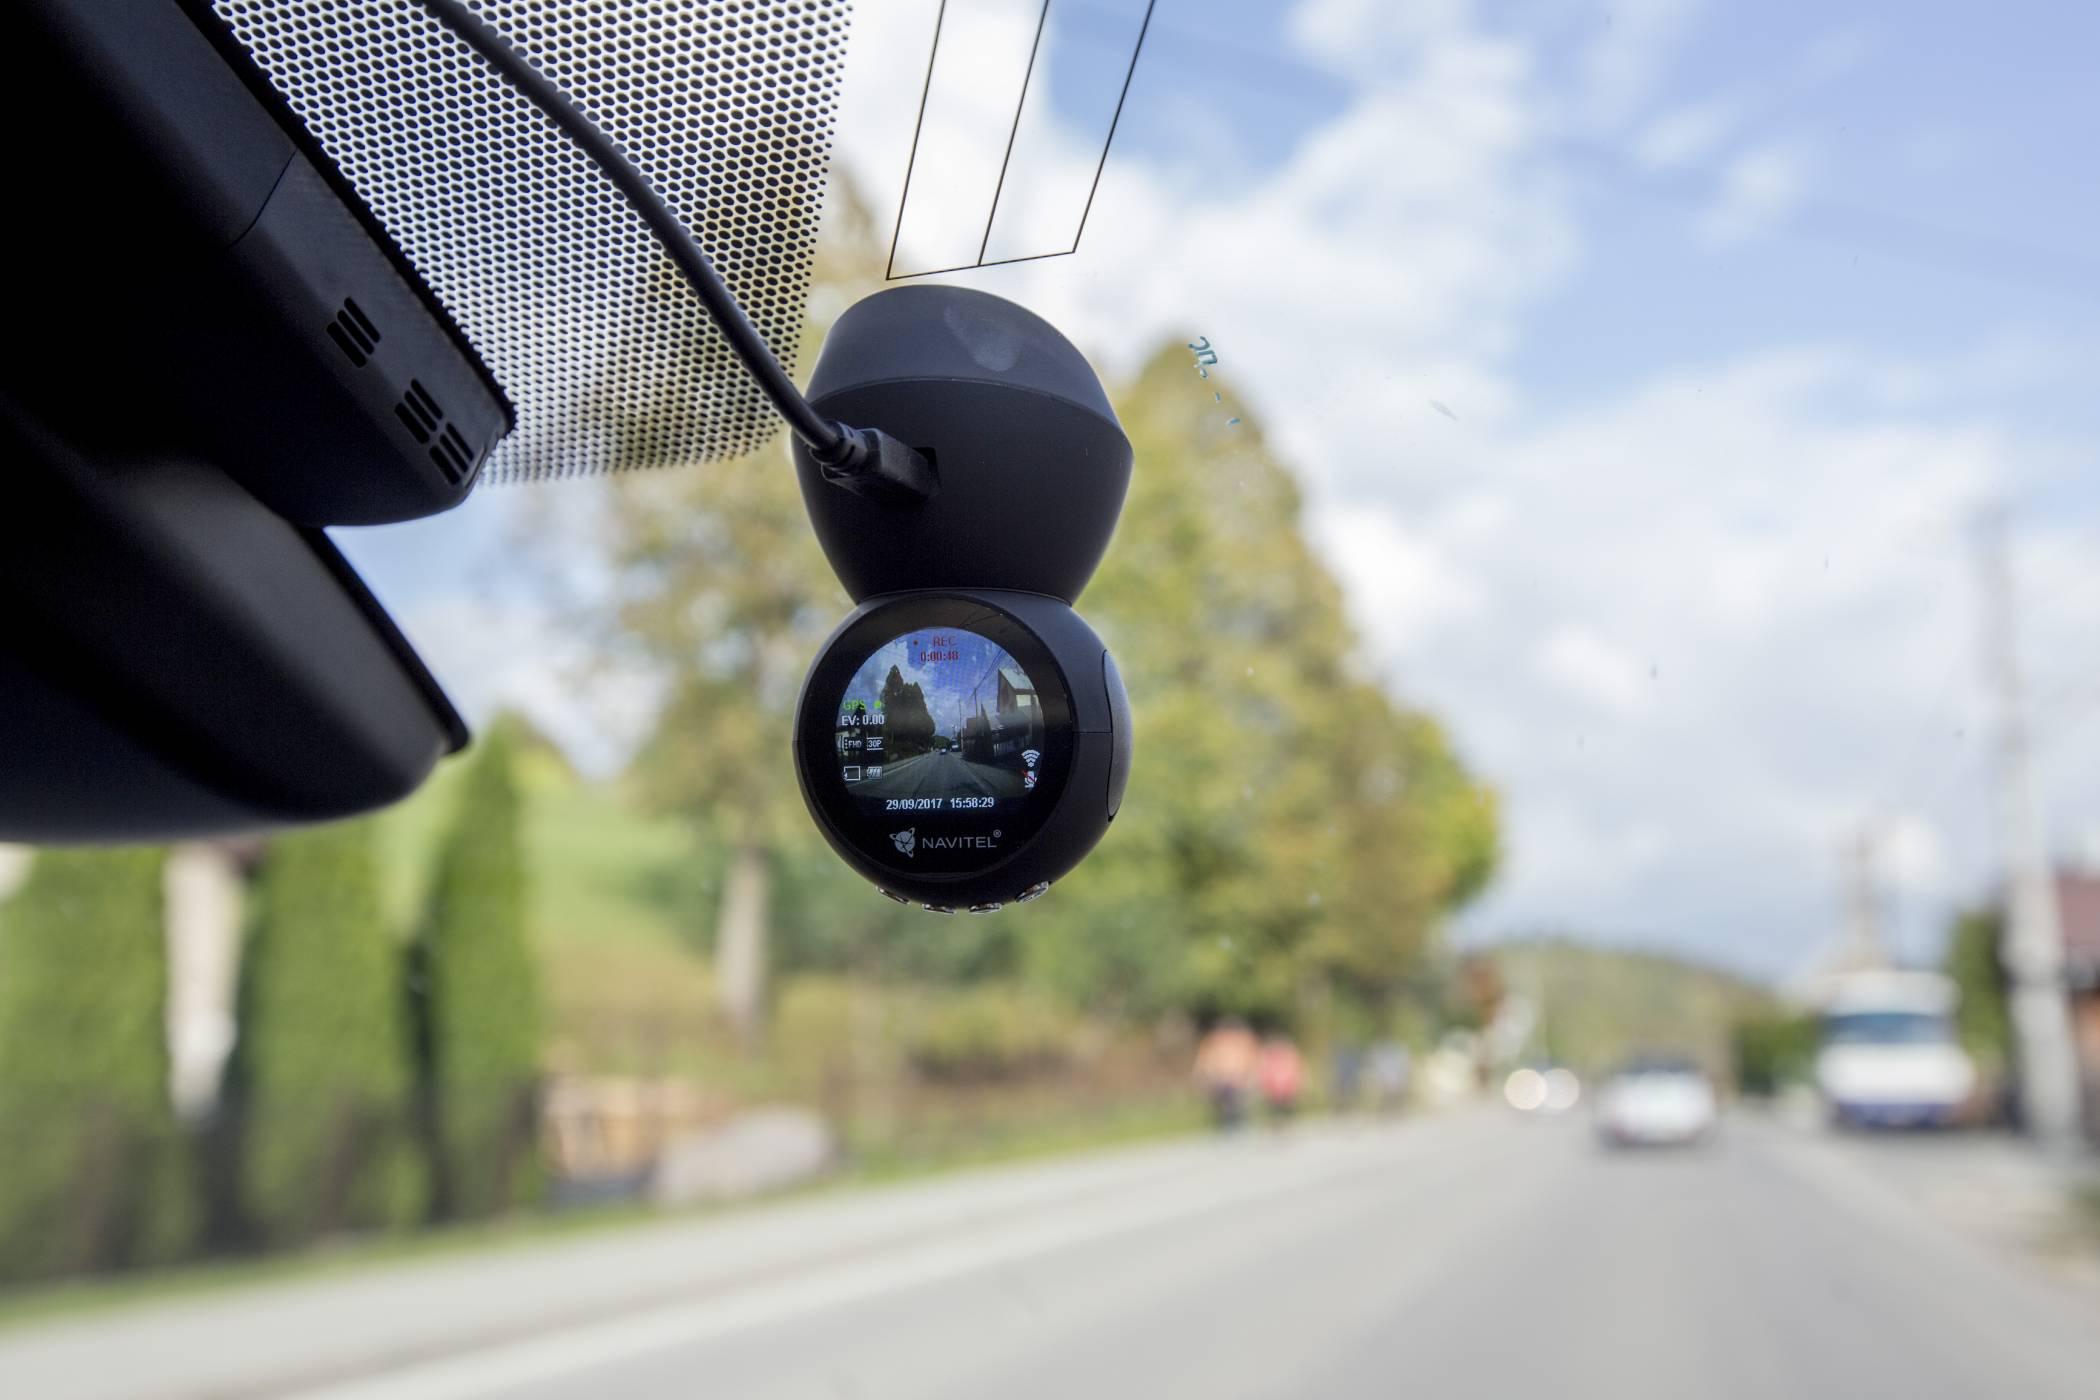 Видеорегистратор Navitel R1000: още едно око на пътя не вреди (РЕВЮ)